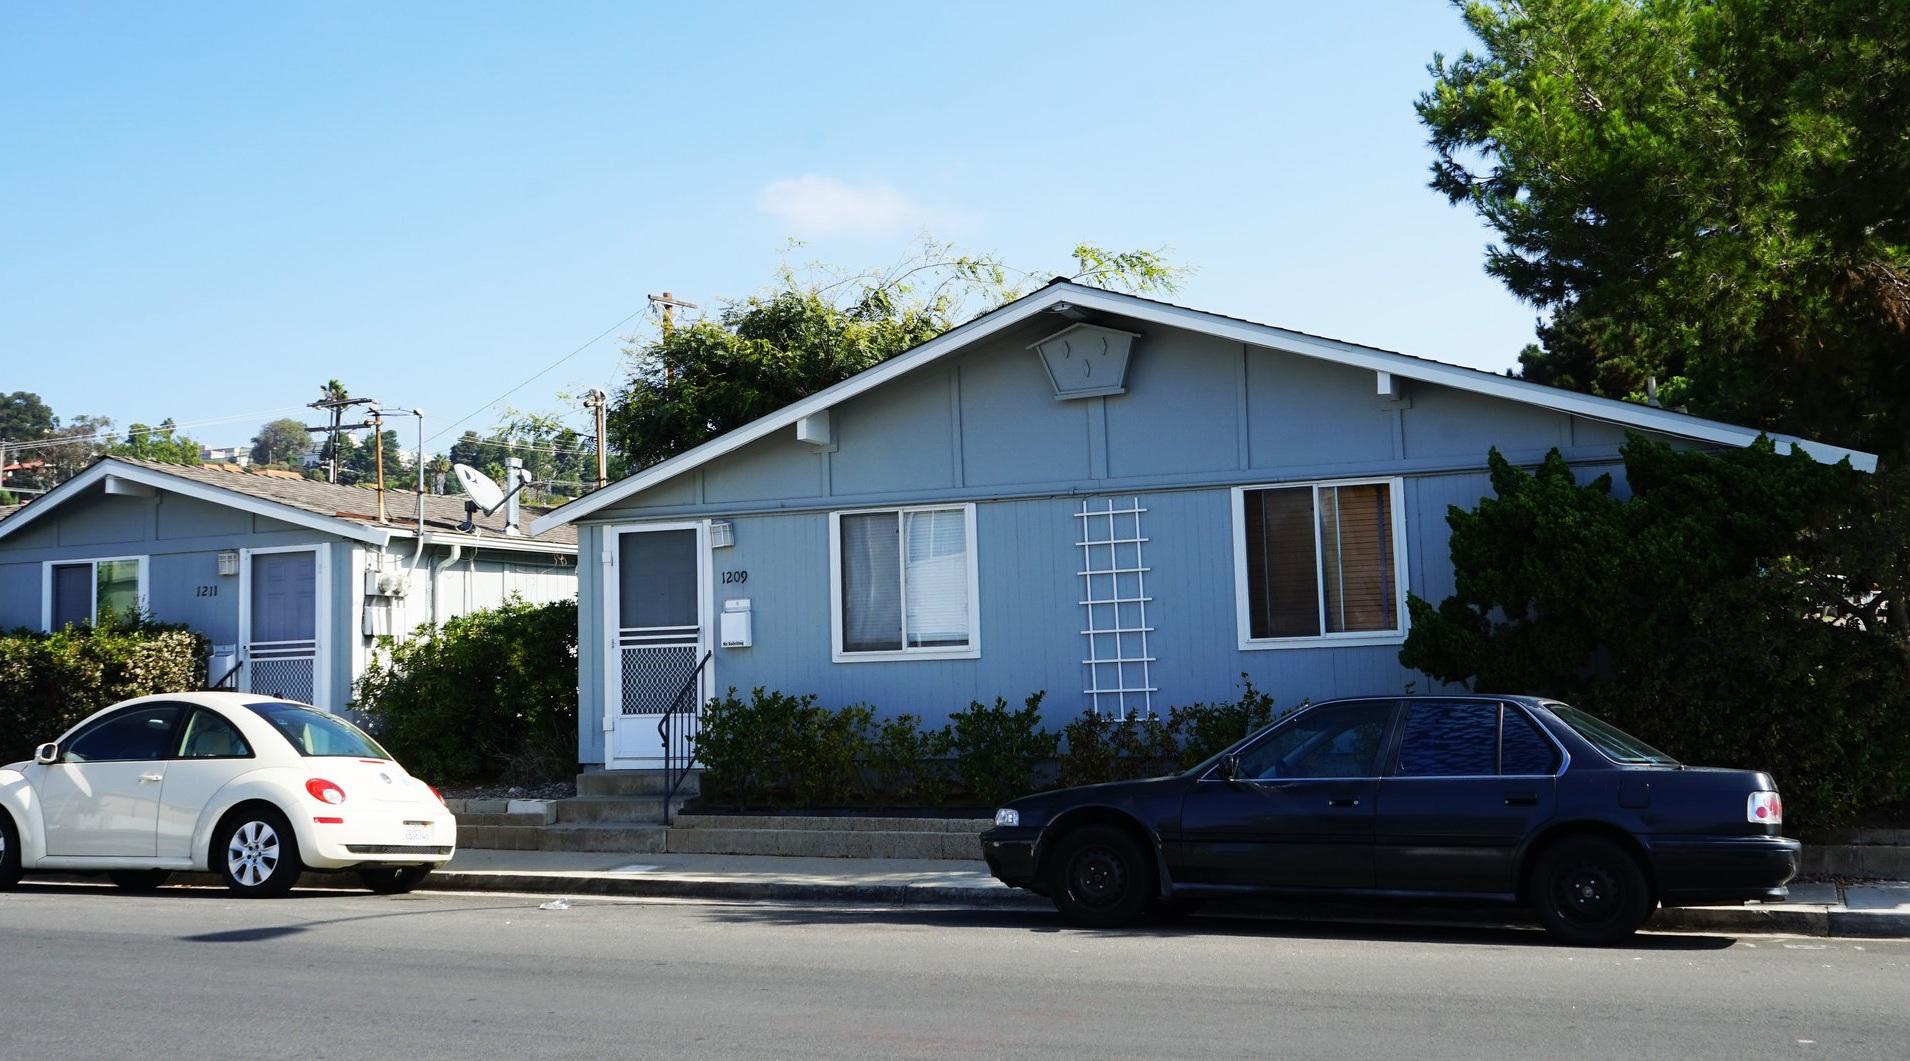 1209 Azusa Street - Morena8 Units$1,700,000